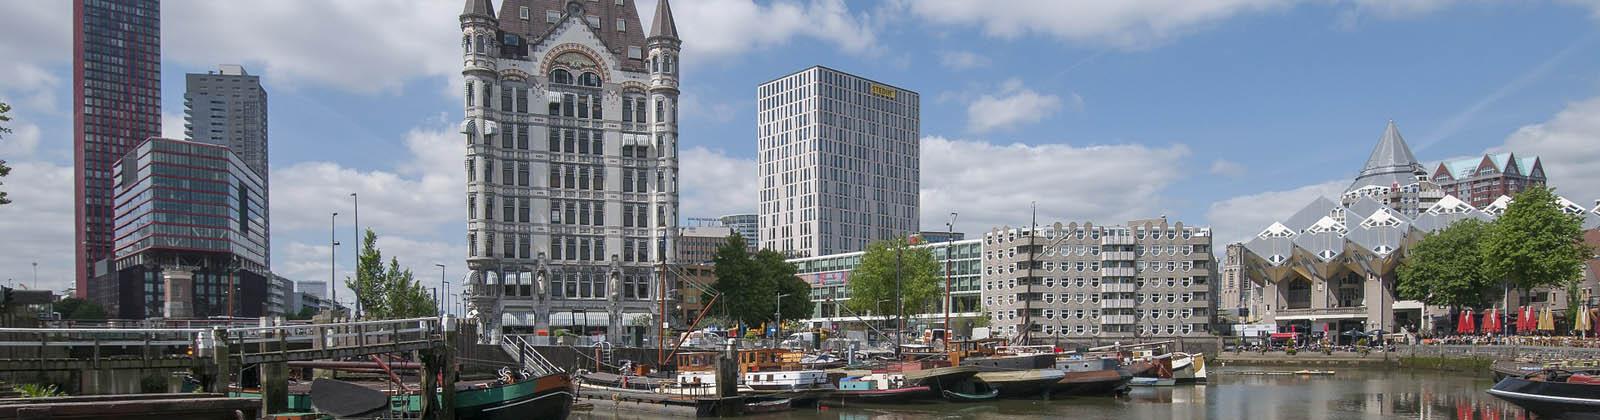 DMC-Rotterdam-travel-agency